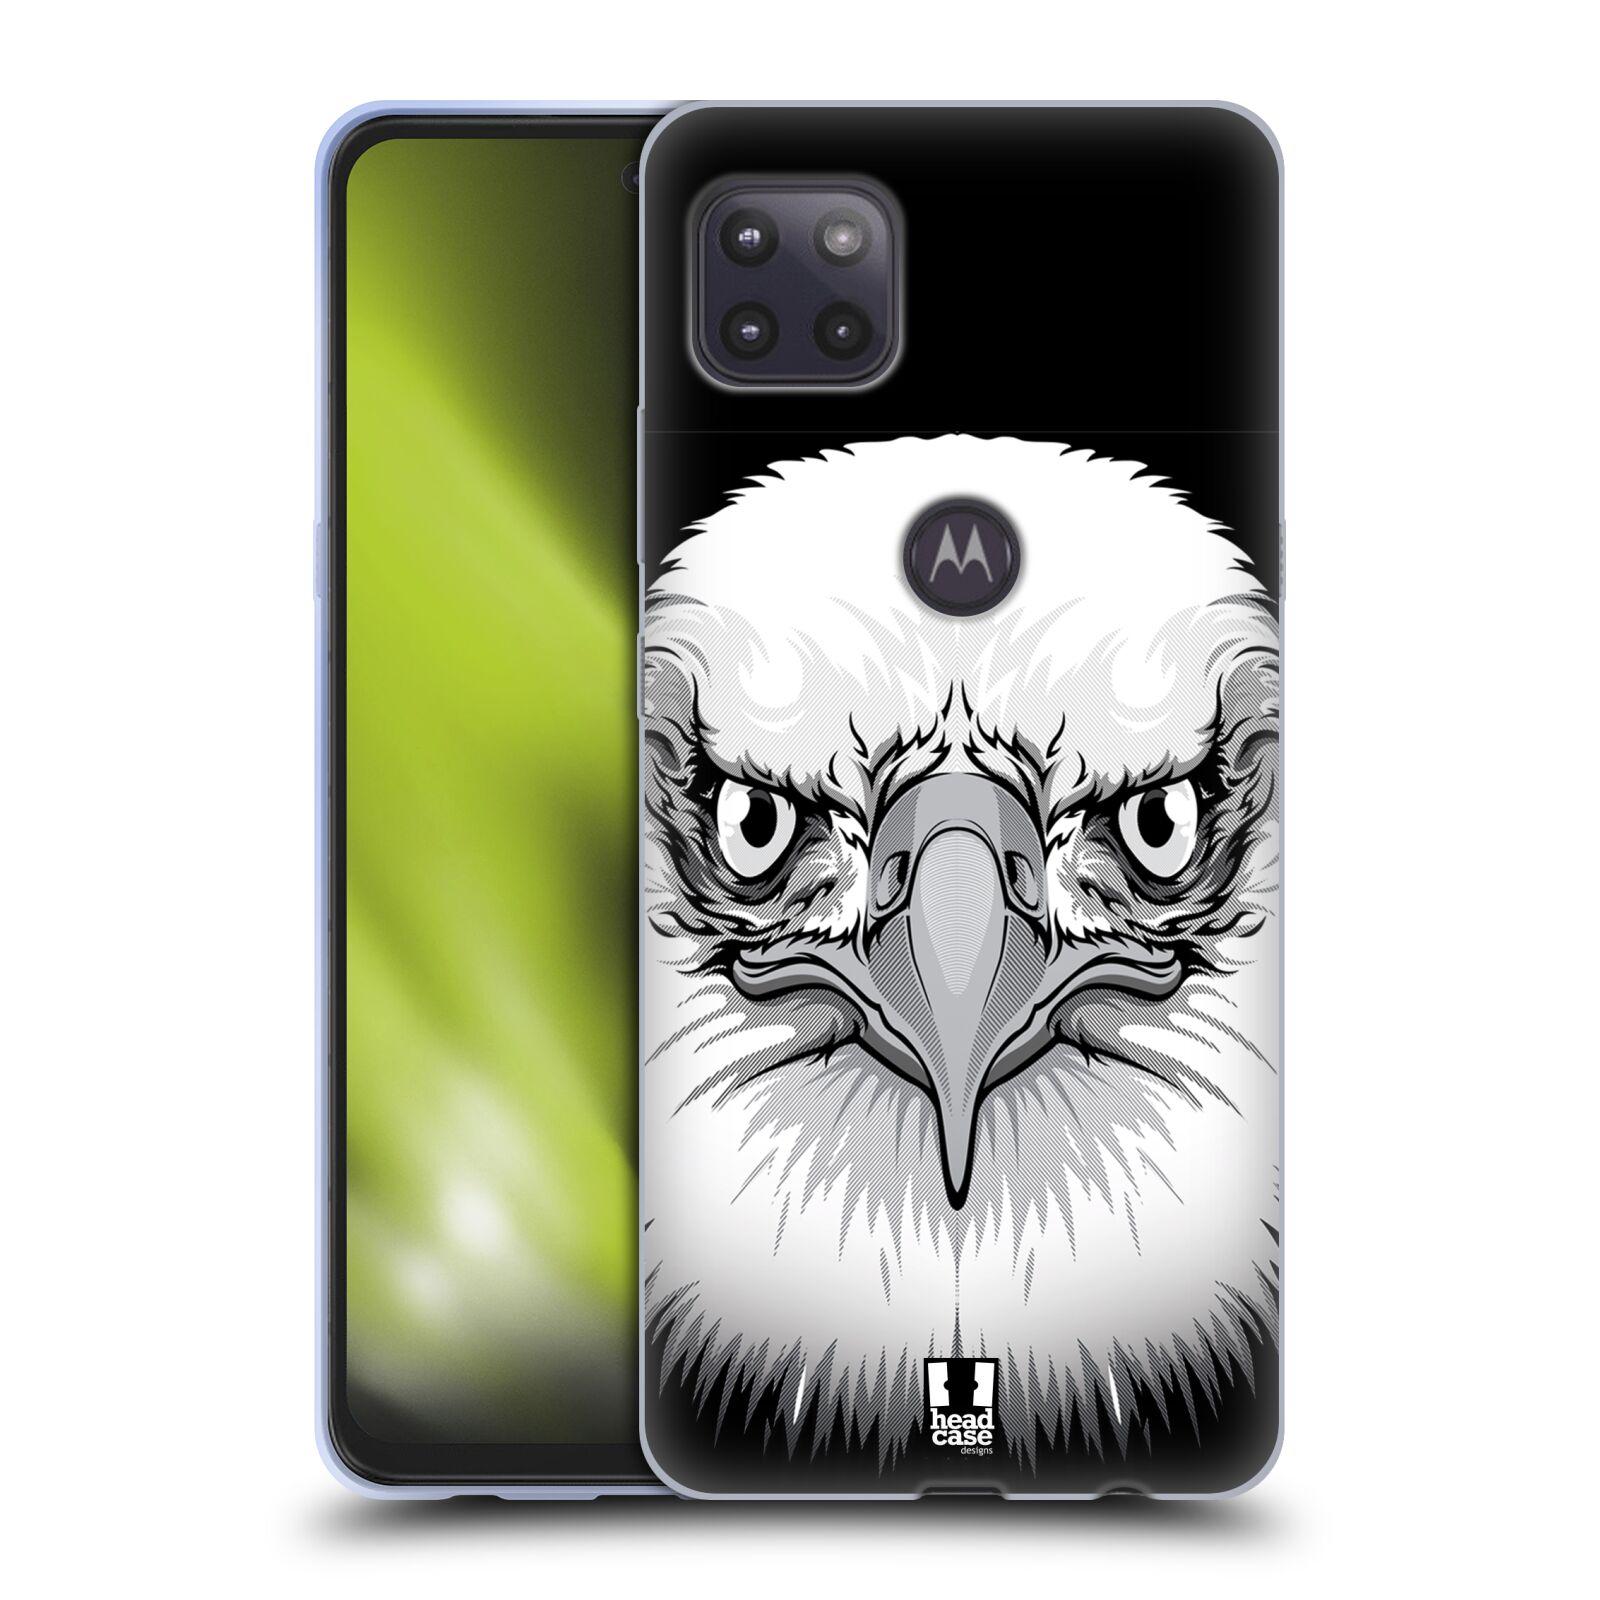 Silikonové pouzdro na mobil Motorola Moto G 5G - Head Case - ILUSTROVANÝ OREL